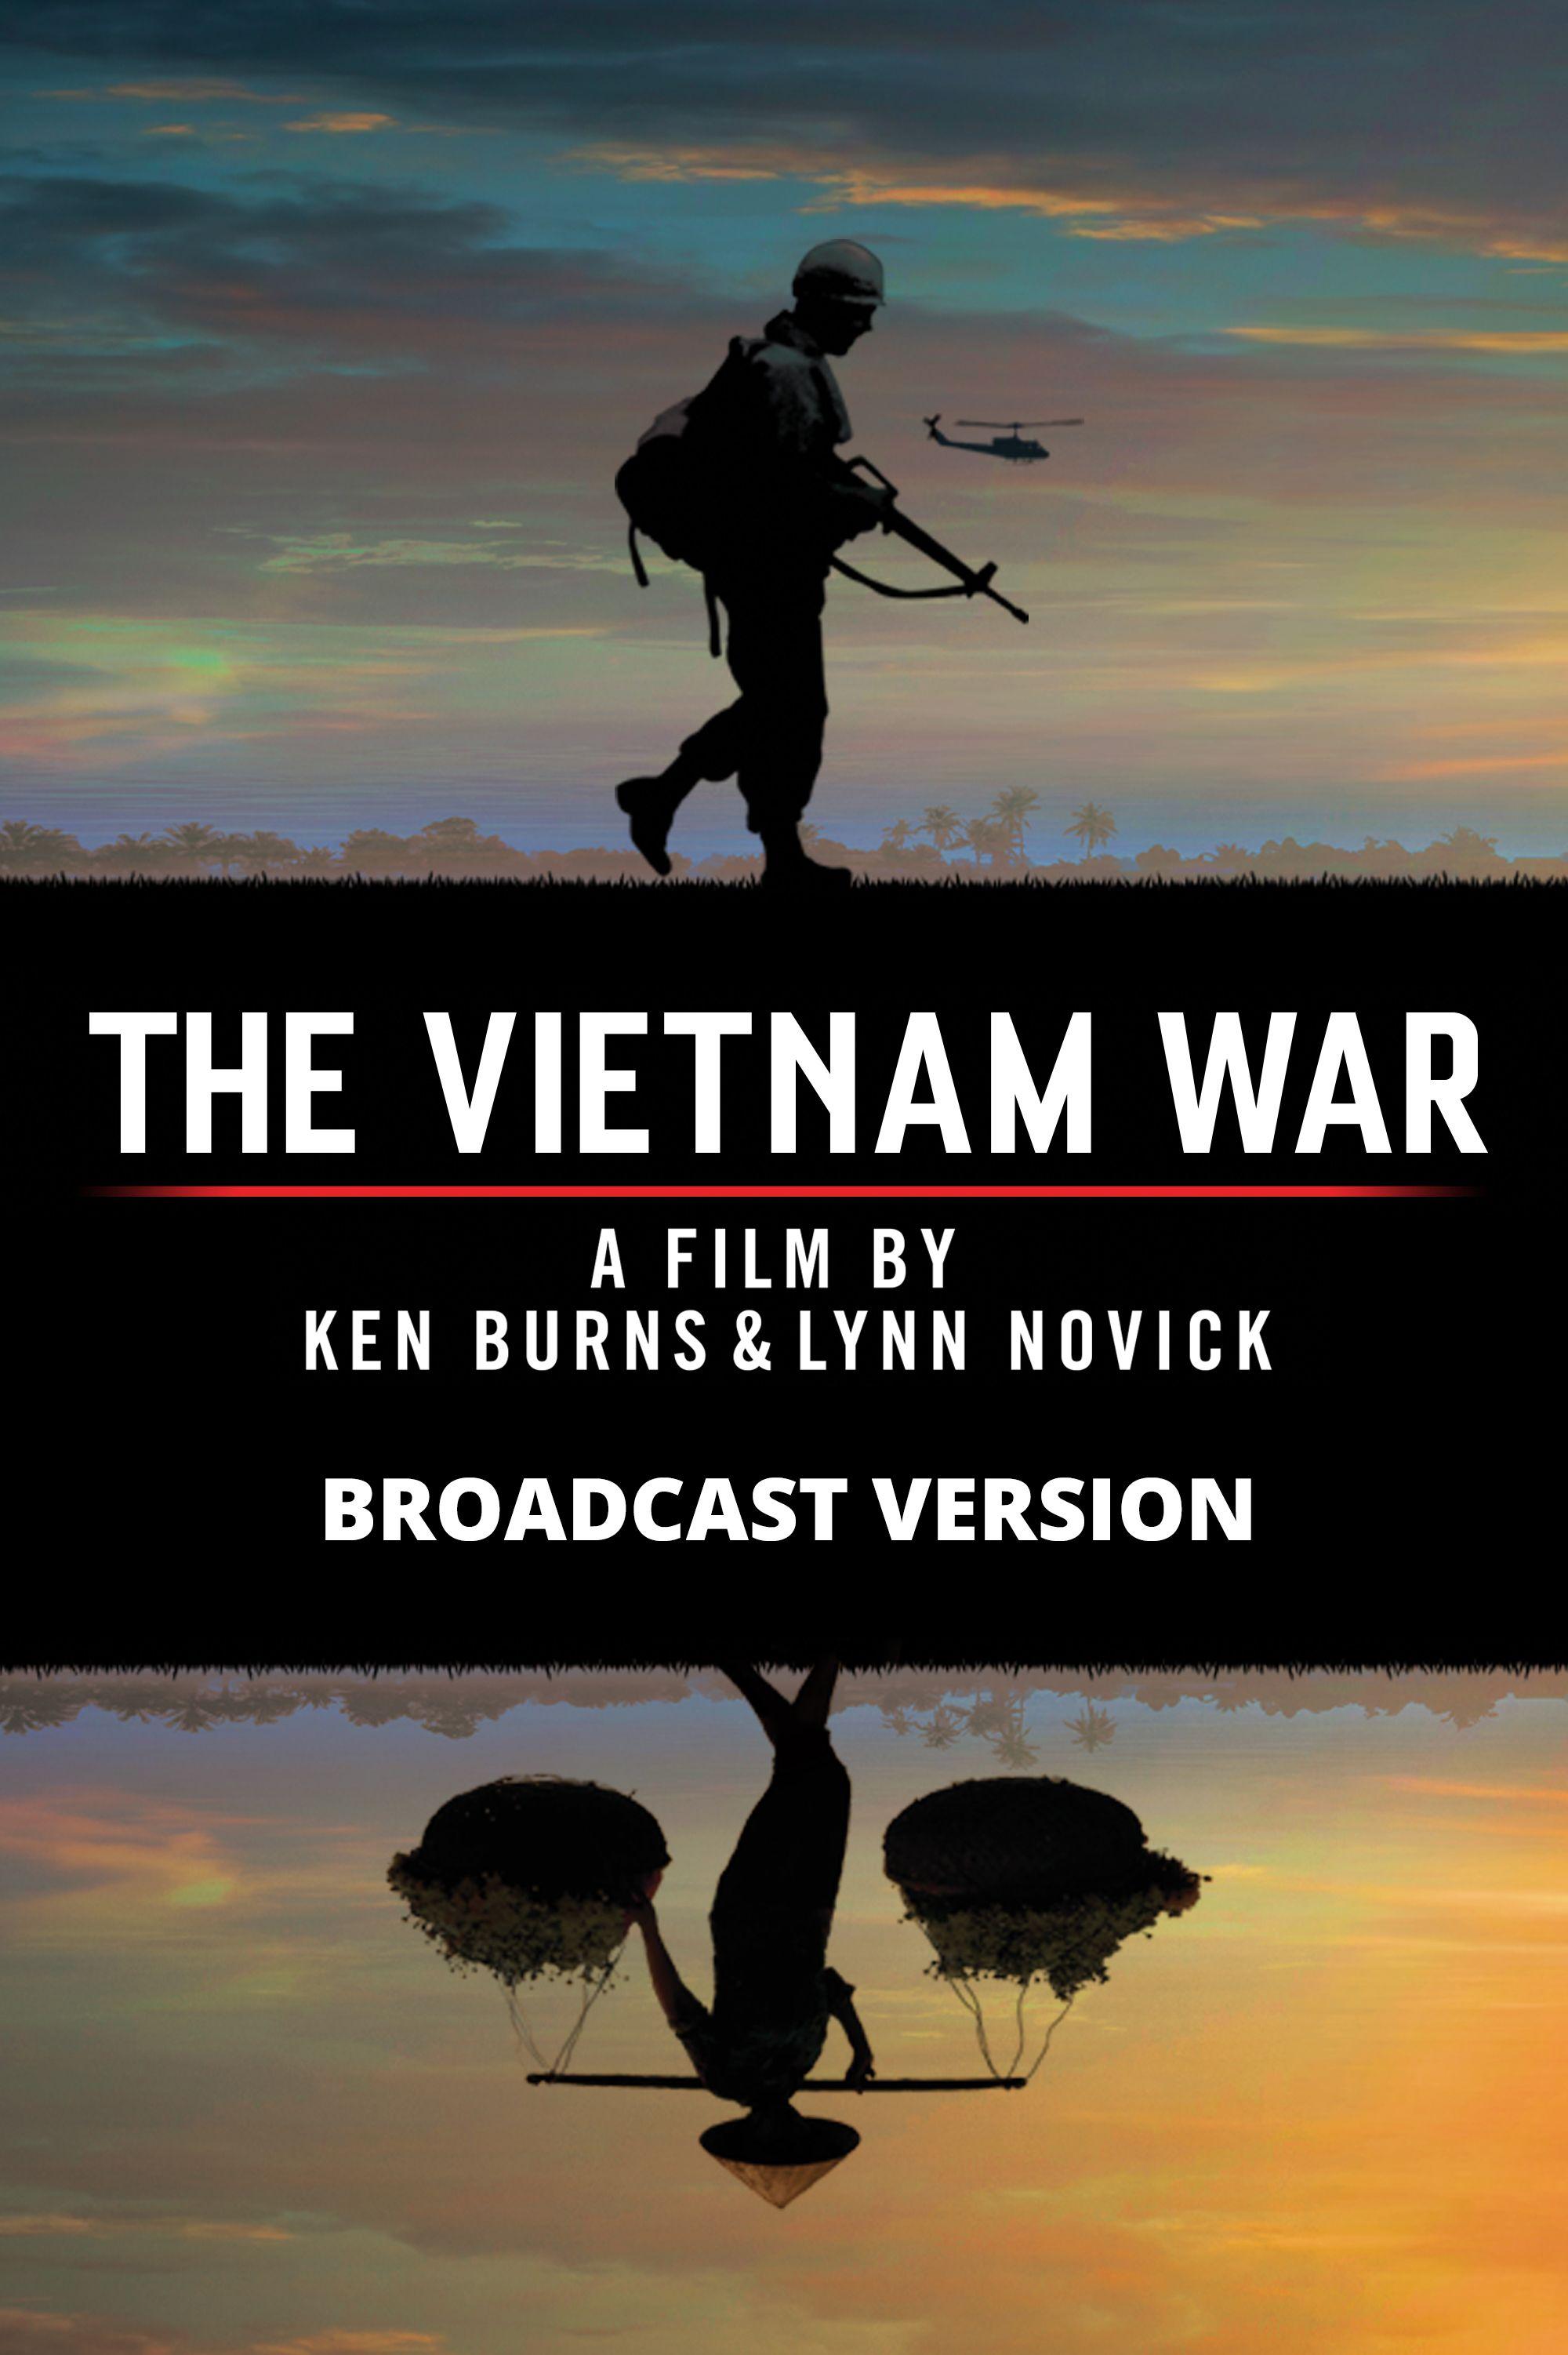 Vietnam War Correspondent Joe Galloway and Support for Women Veterans with TBI